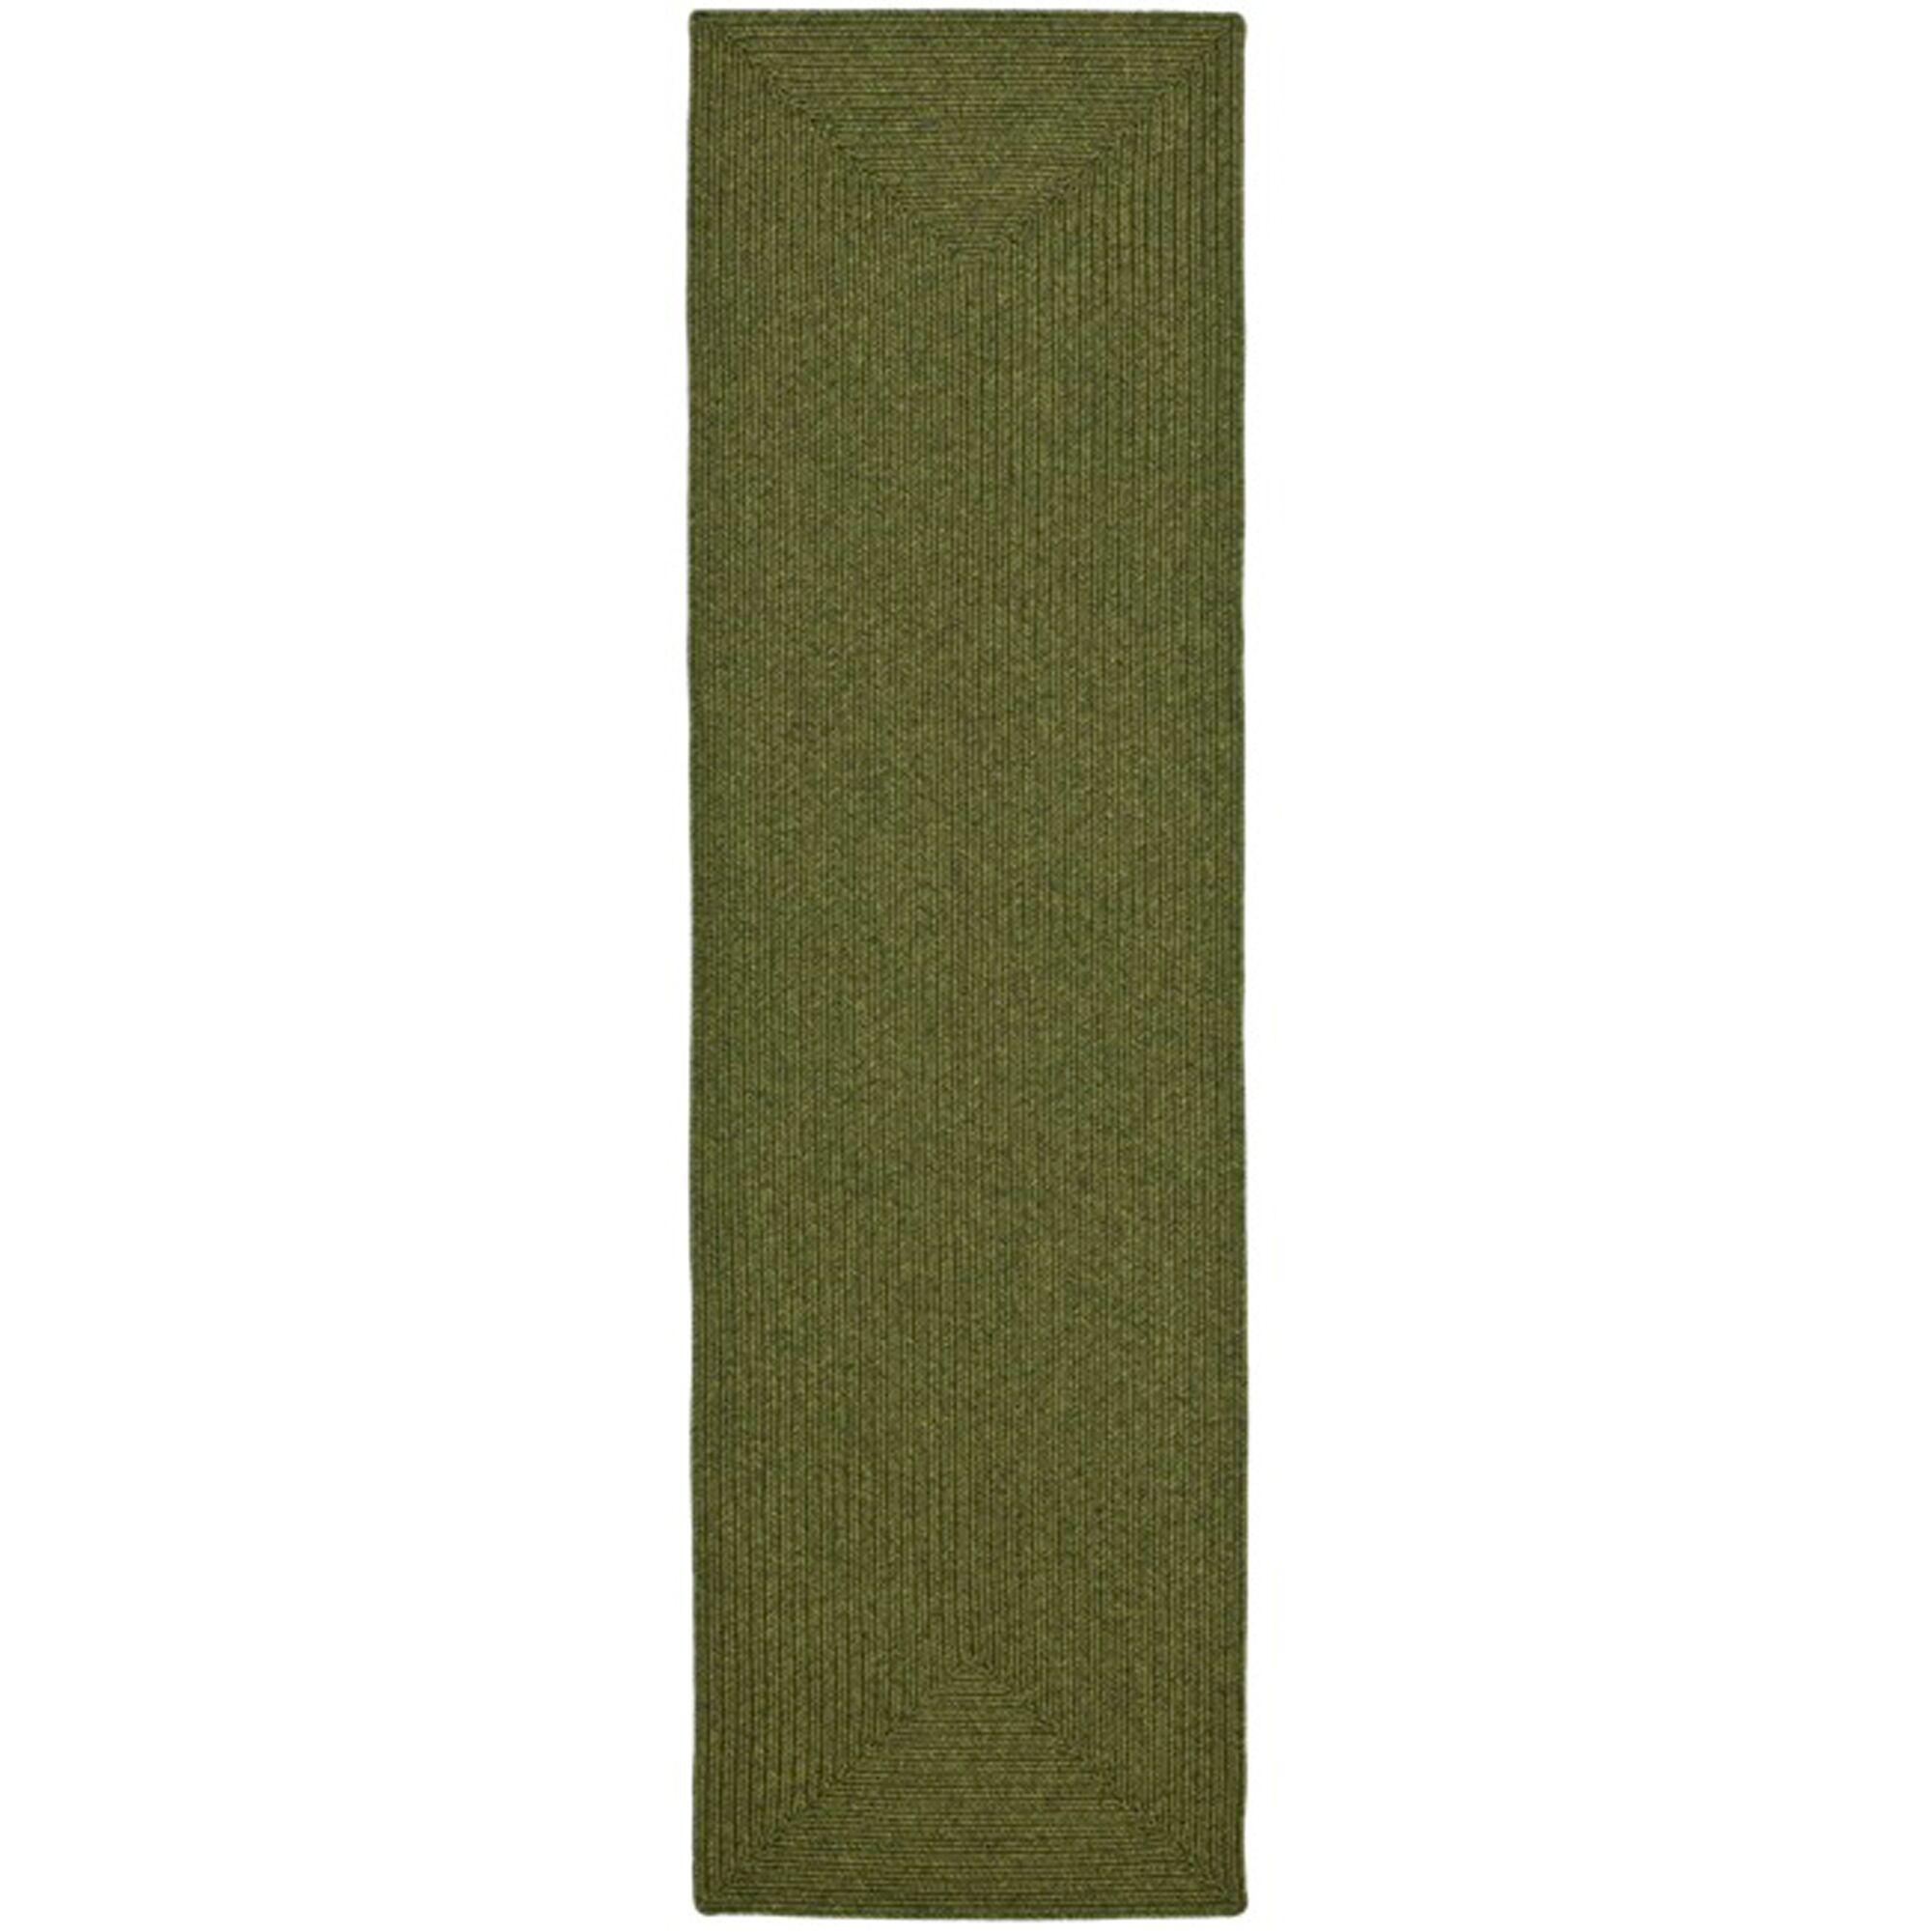 Lissie Hand-Woven Moss Green Area Rug Rug Size: Runner 2'3